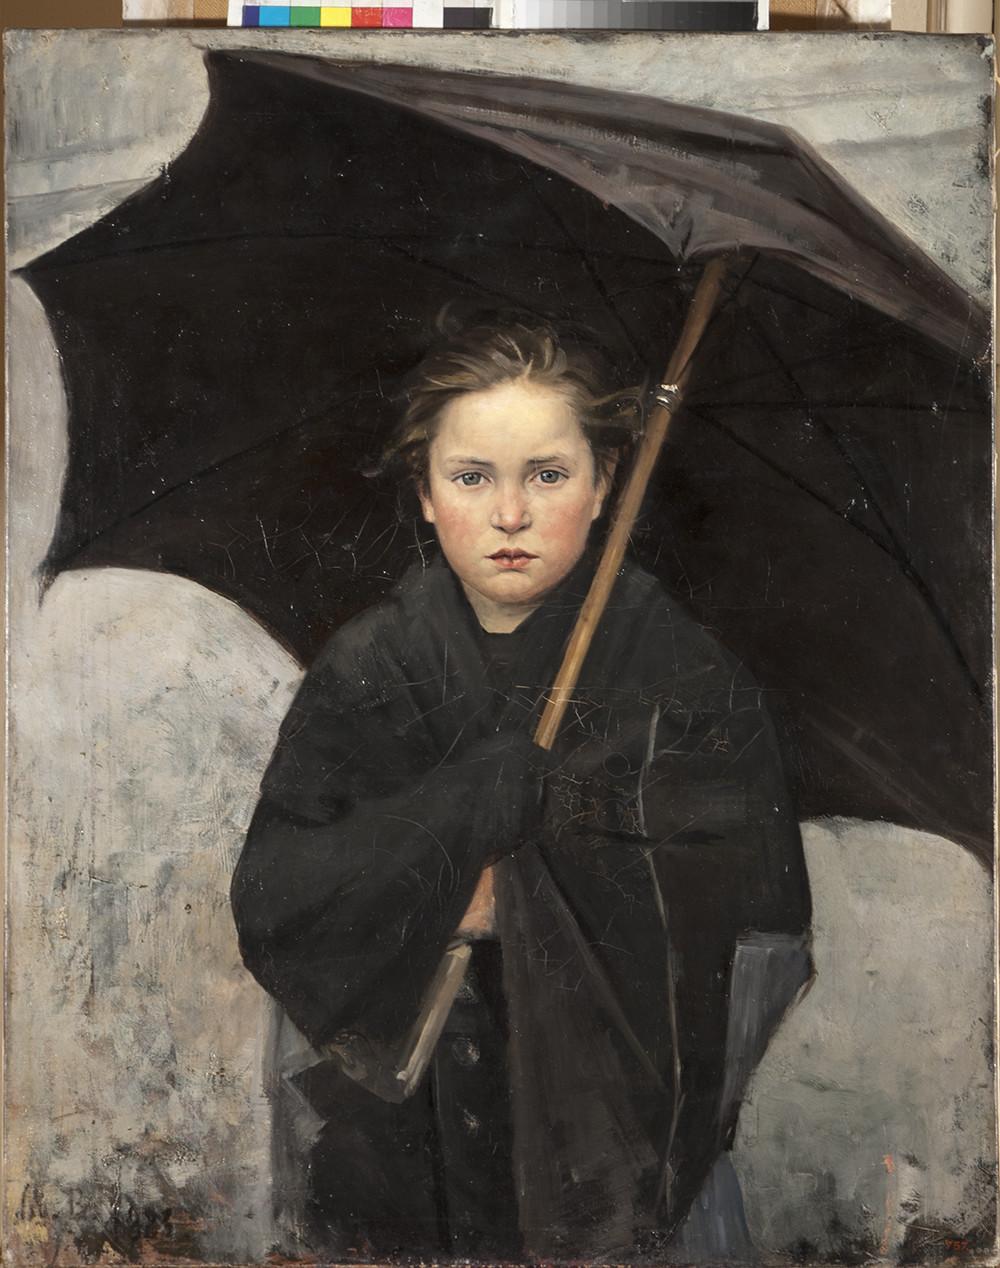 Maria Bashkirtseva / Ombrello, 1883